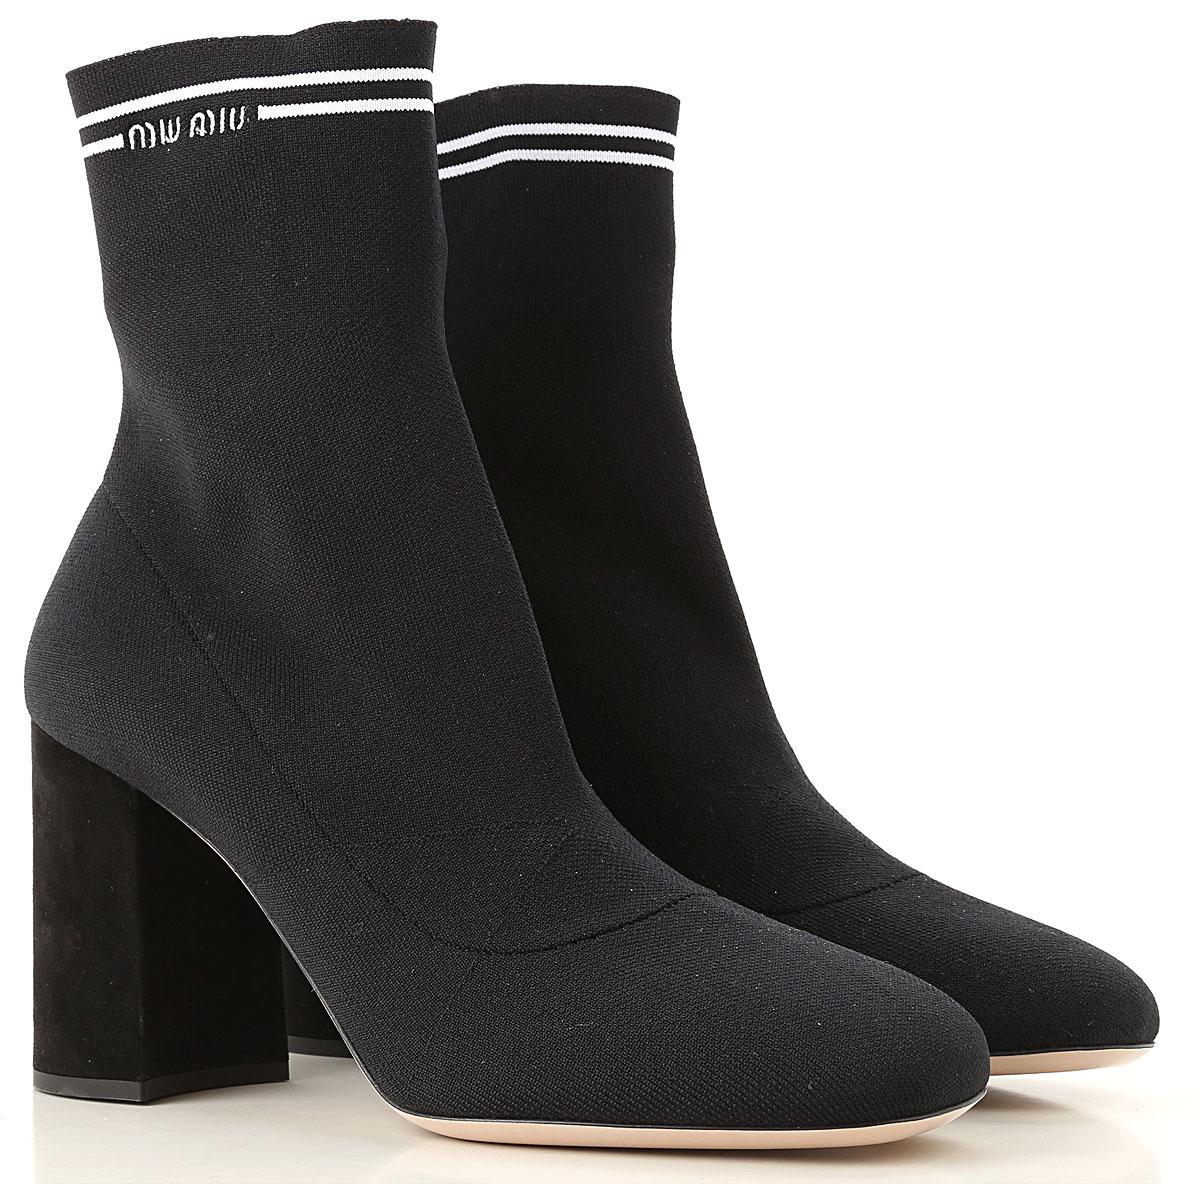 Image of Miu Miu Boots for Women, Booties, Black, Elastane, 2017, 10 8 8.5 9